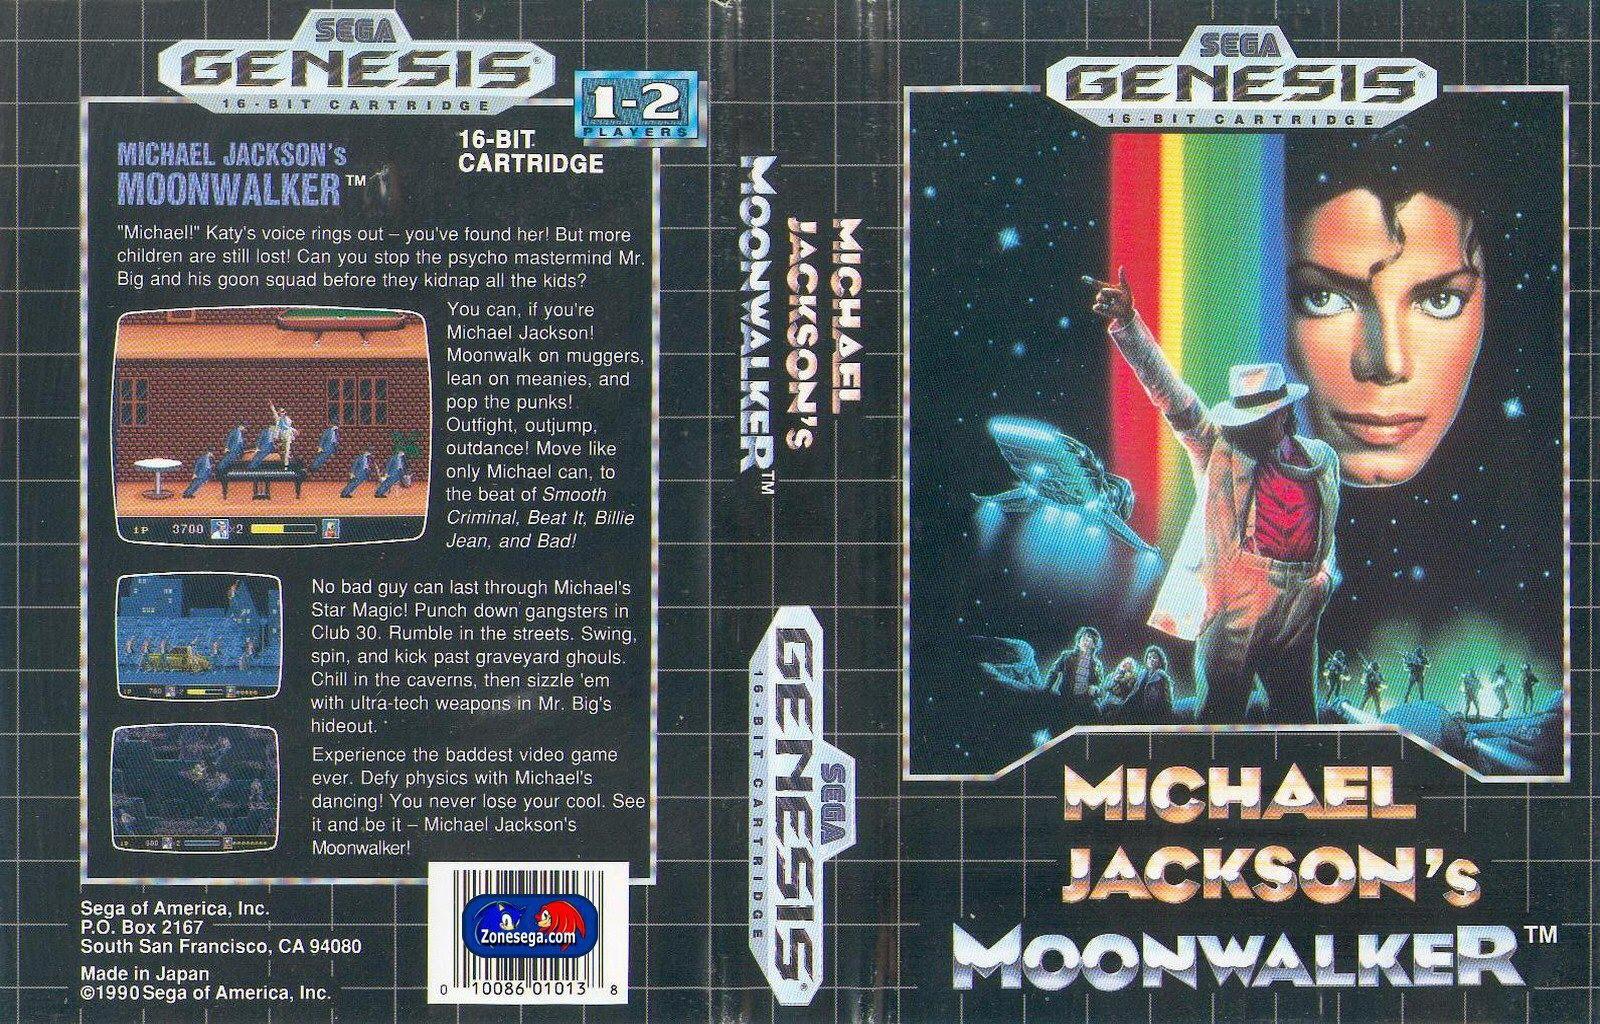 http://1.bp.blogspot.com/_xqU8aCV8ADc/TLDDBrUEiAI/AAAAAAAAAMQ/Wperha7lhQ0/s1600/Michael+Jackson%27s+-+Moonwalker+%5BUSA%5D.jpg